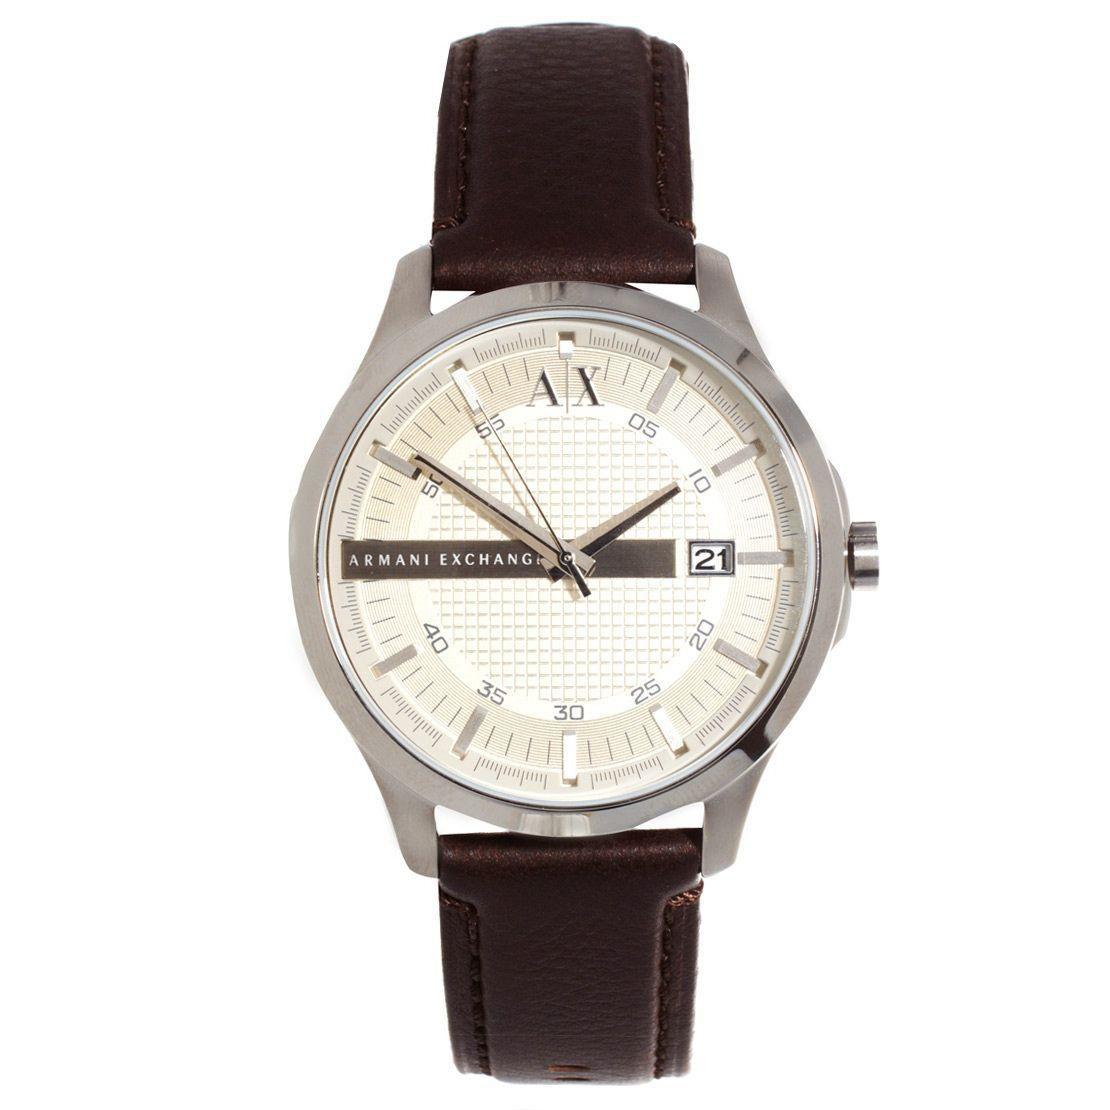 Relógio Masculino Armani Exchange AX2100/0KN 47mm Couro Marrom